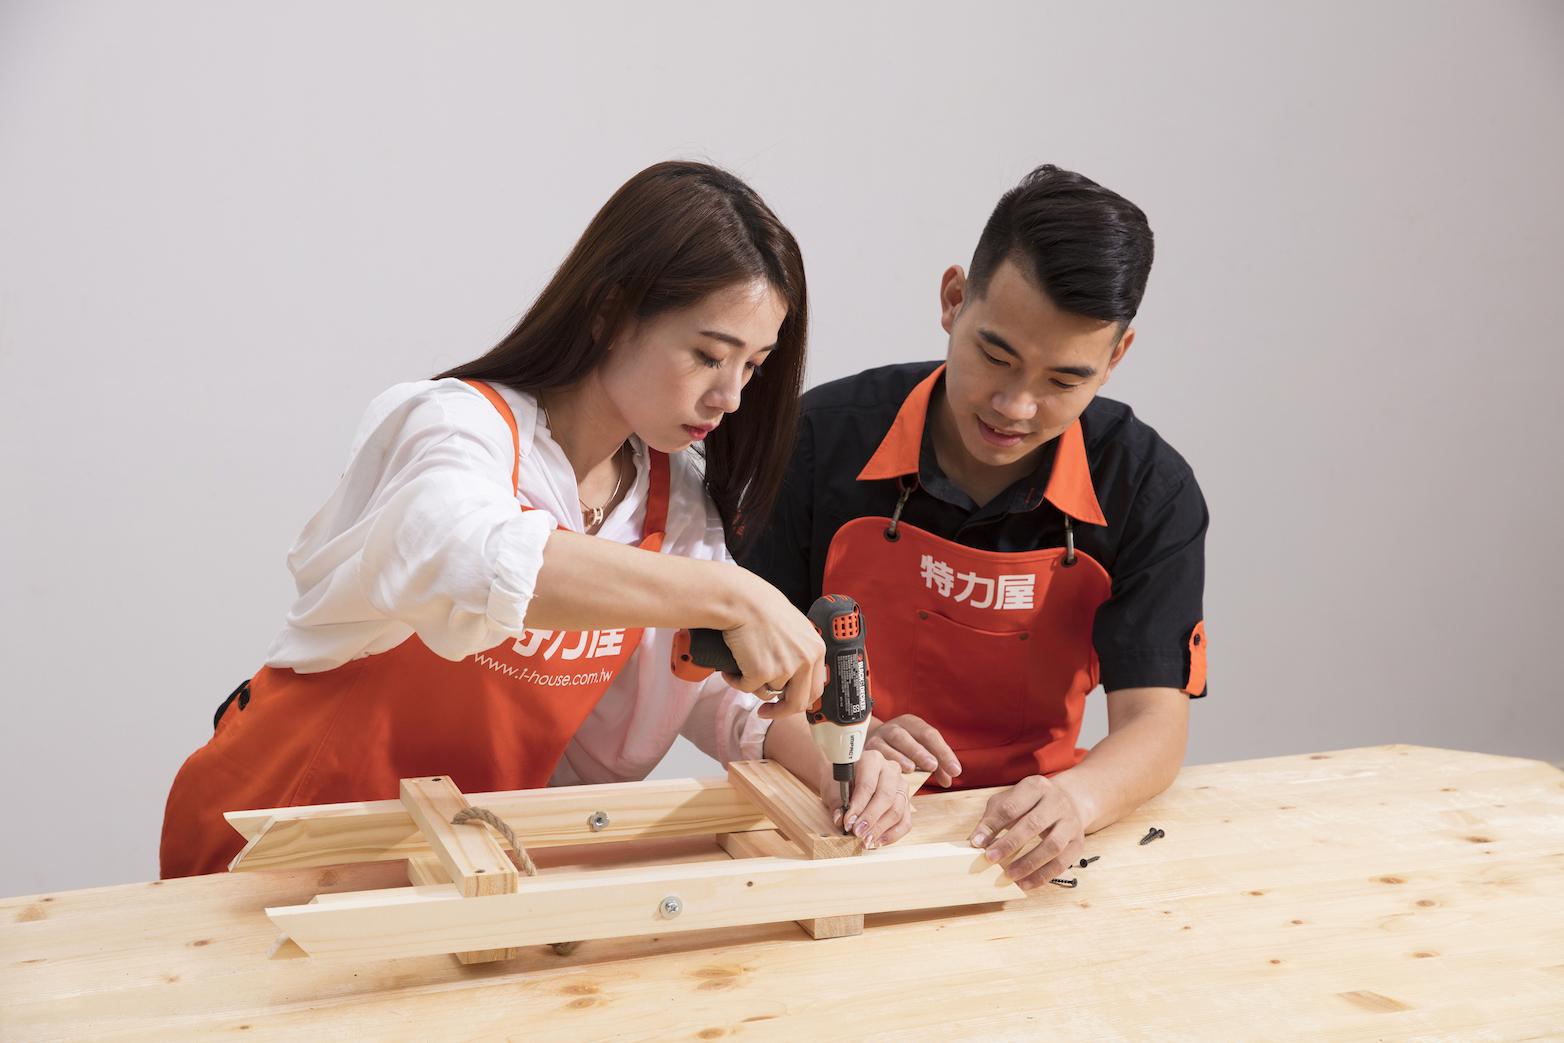 KKday 台灣DIY課程 即減$50優惠碼:第8張圖片